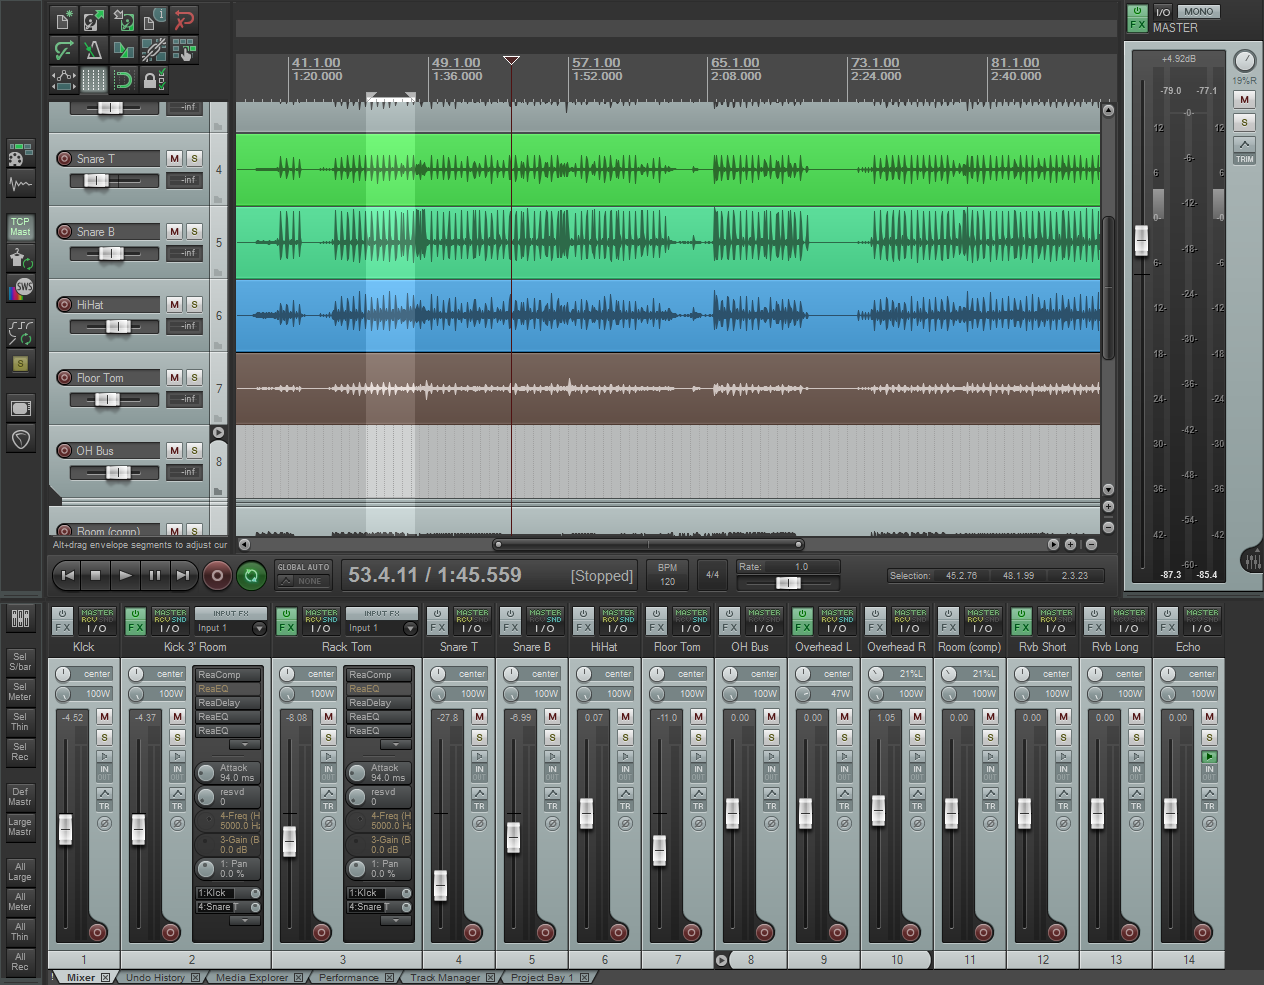 Cockos REAPER Full v5.18 Final - Mixing Software - Full ...